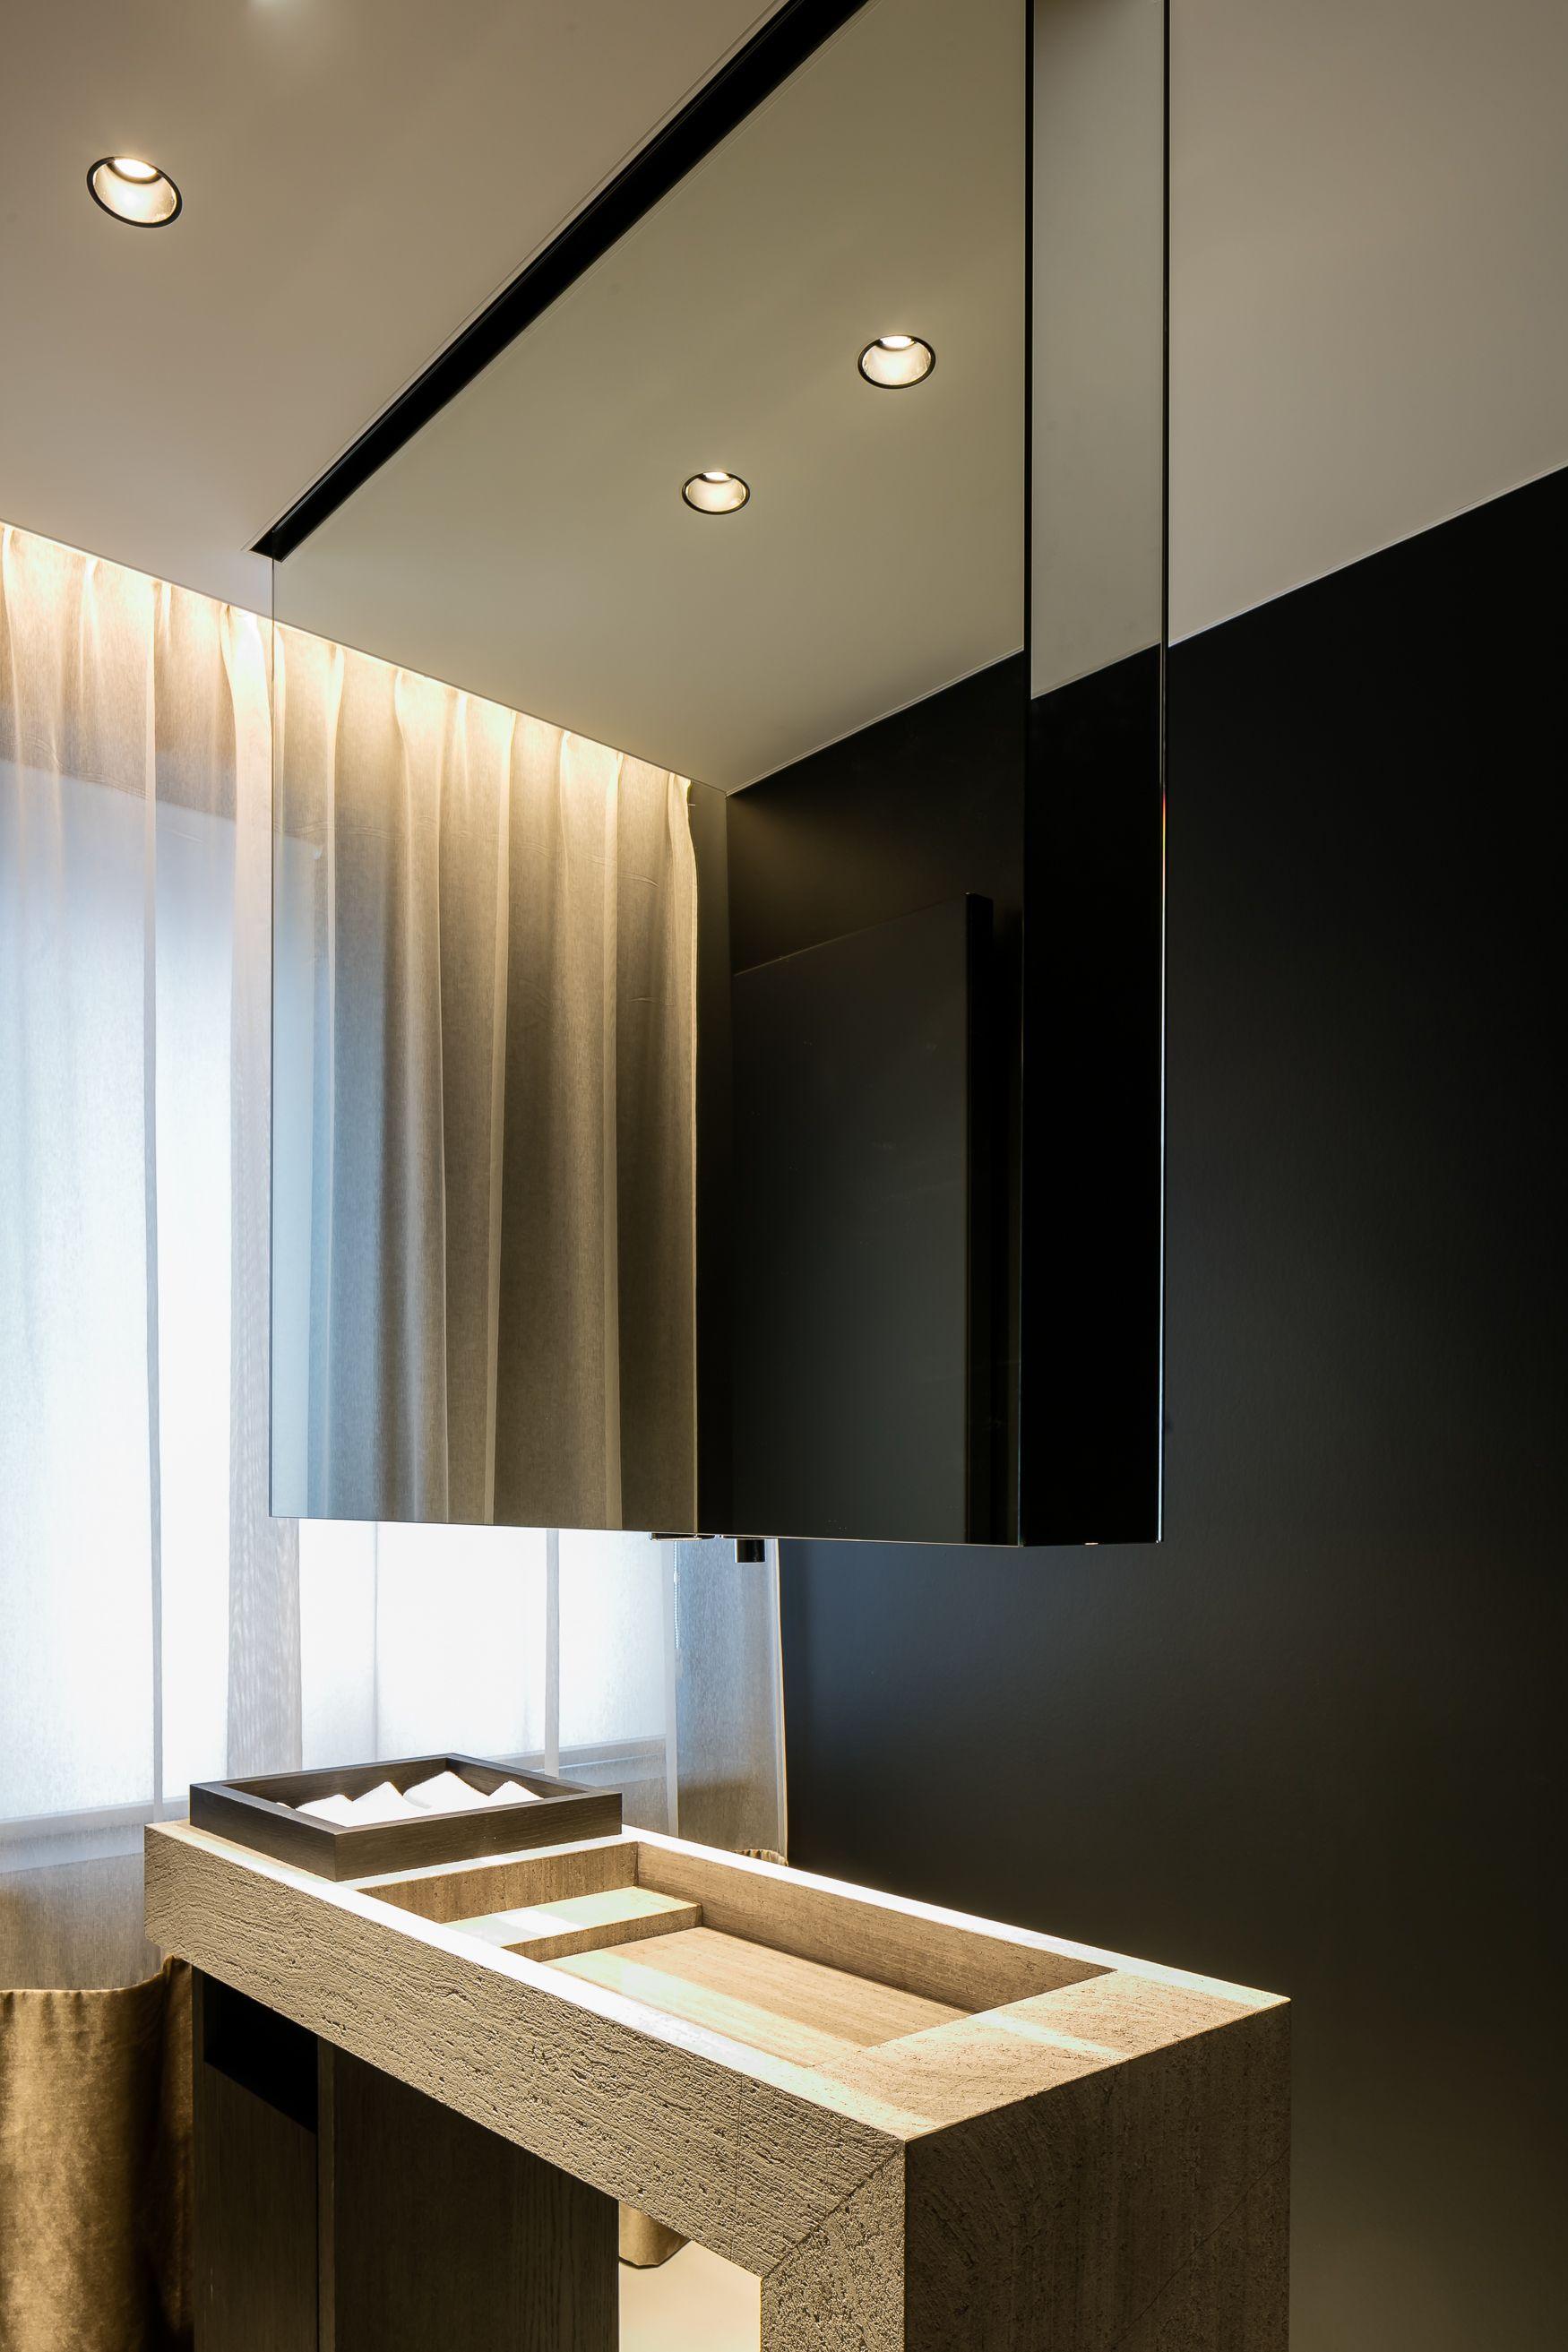 Bathroom Project in Diksmuide Belgium by Ruben Waeles OAK GREY